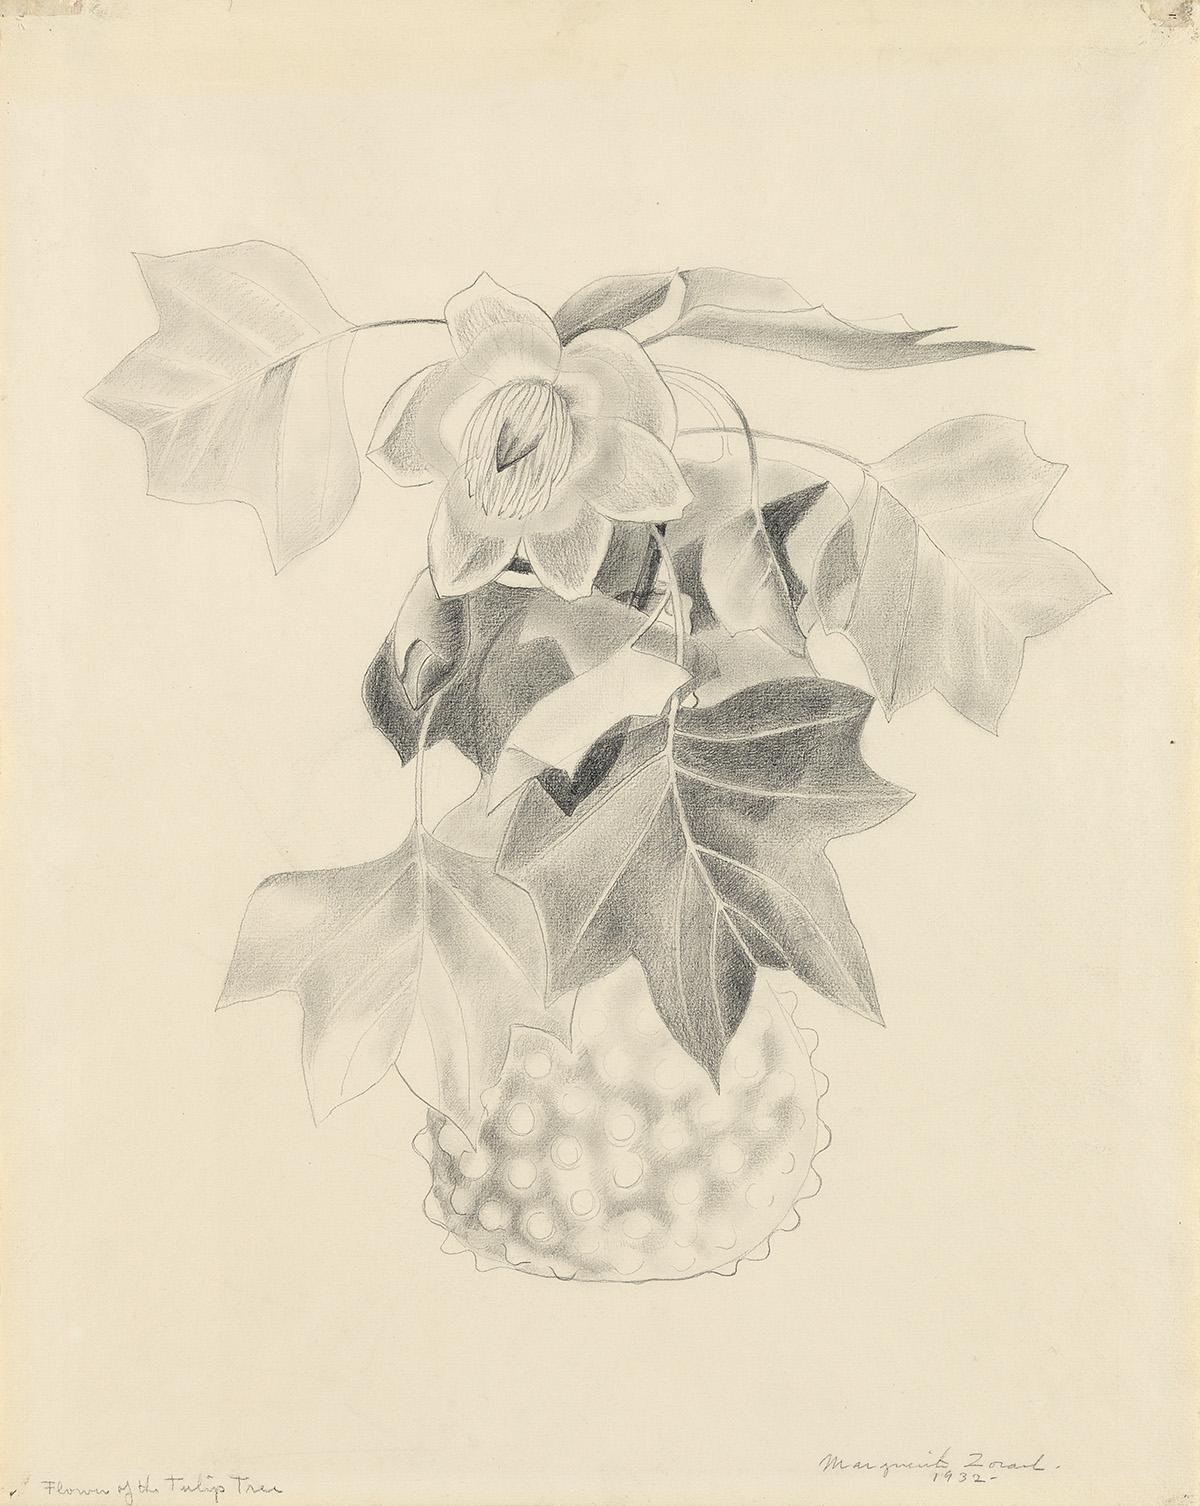 MARGUERITE-ZORACH-Flowers-of-the-Tulip-Tree